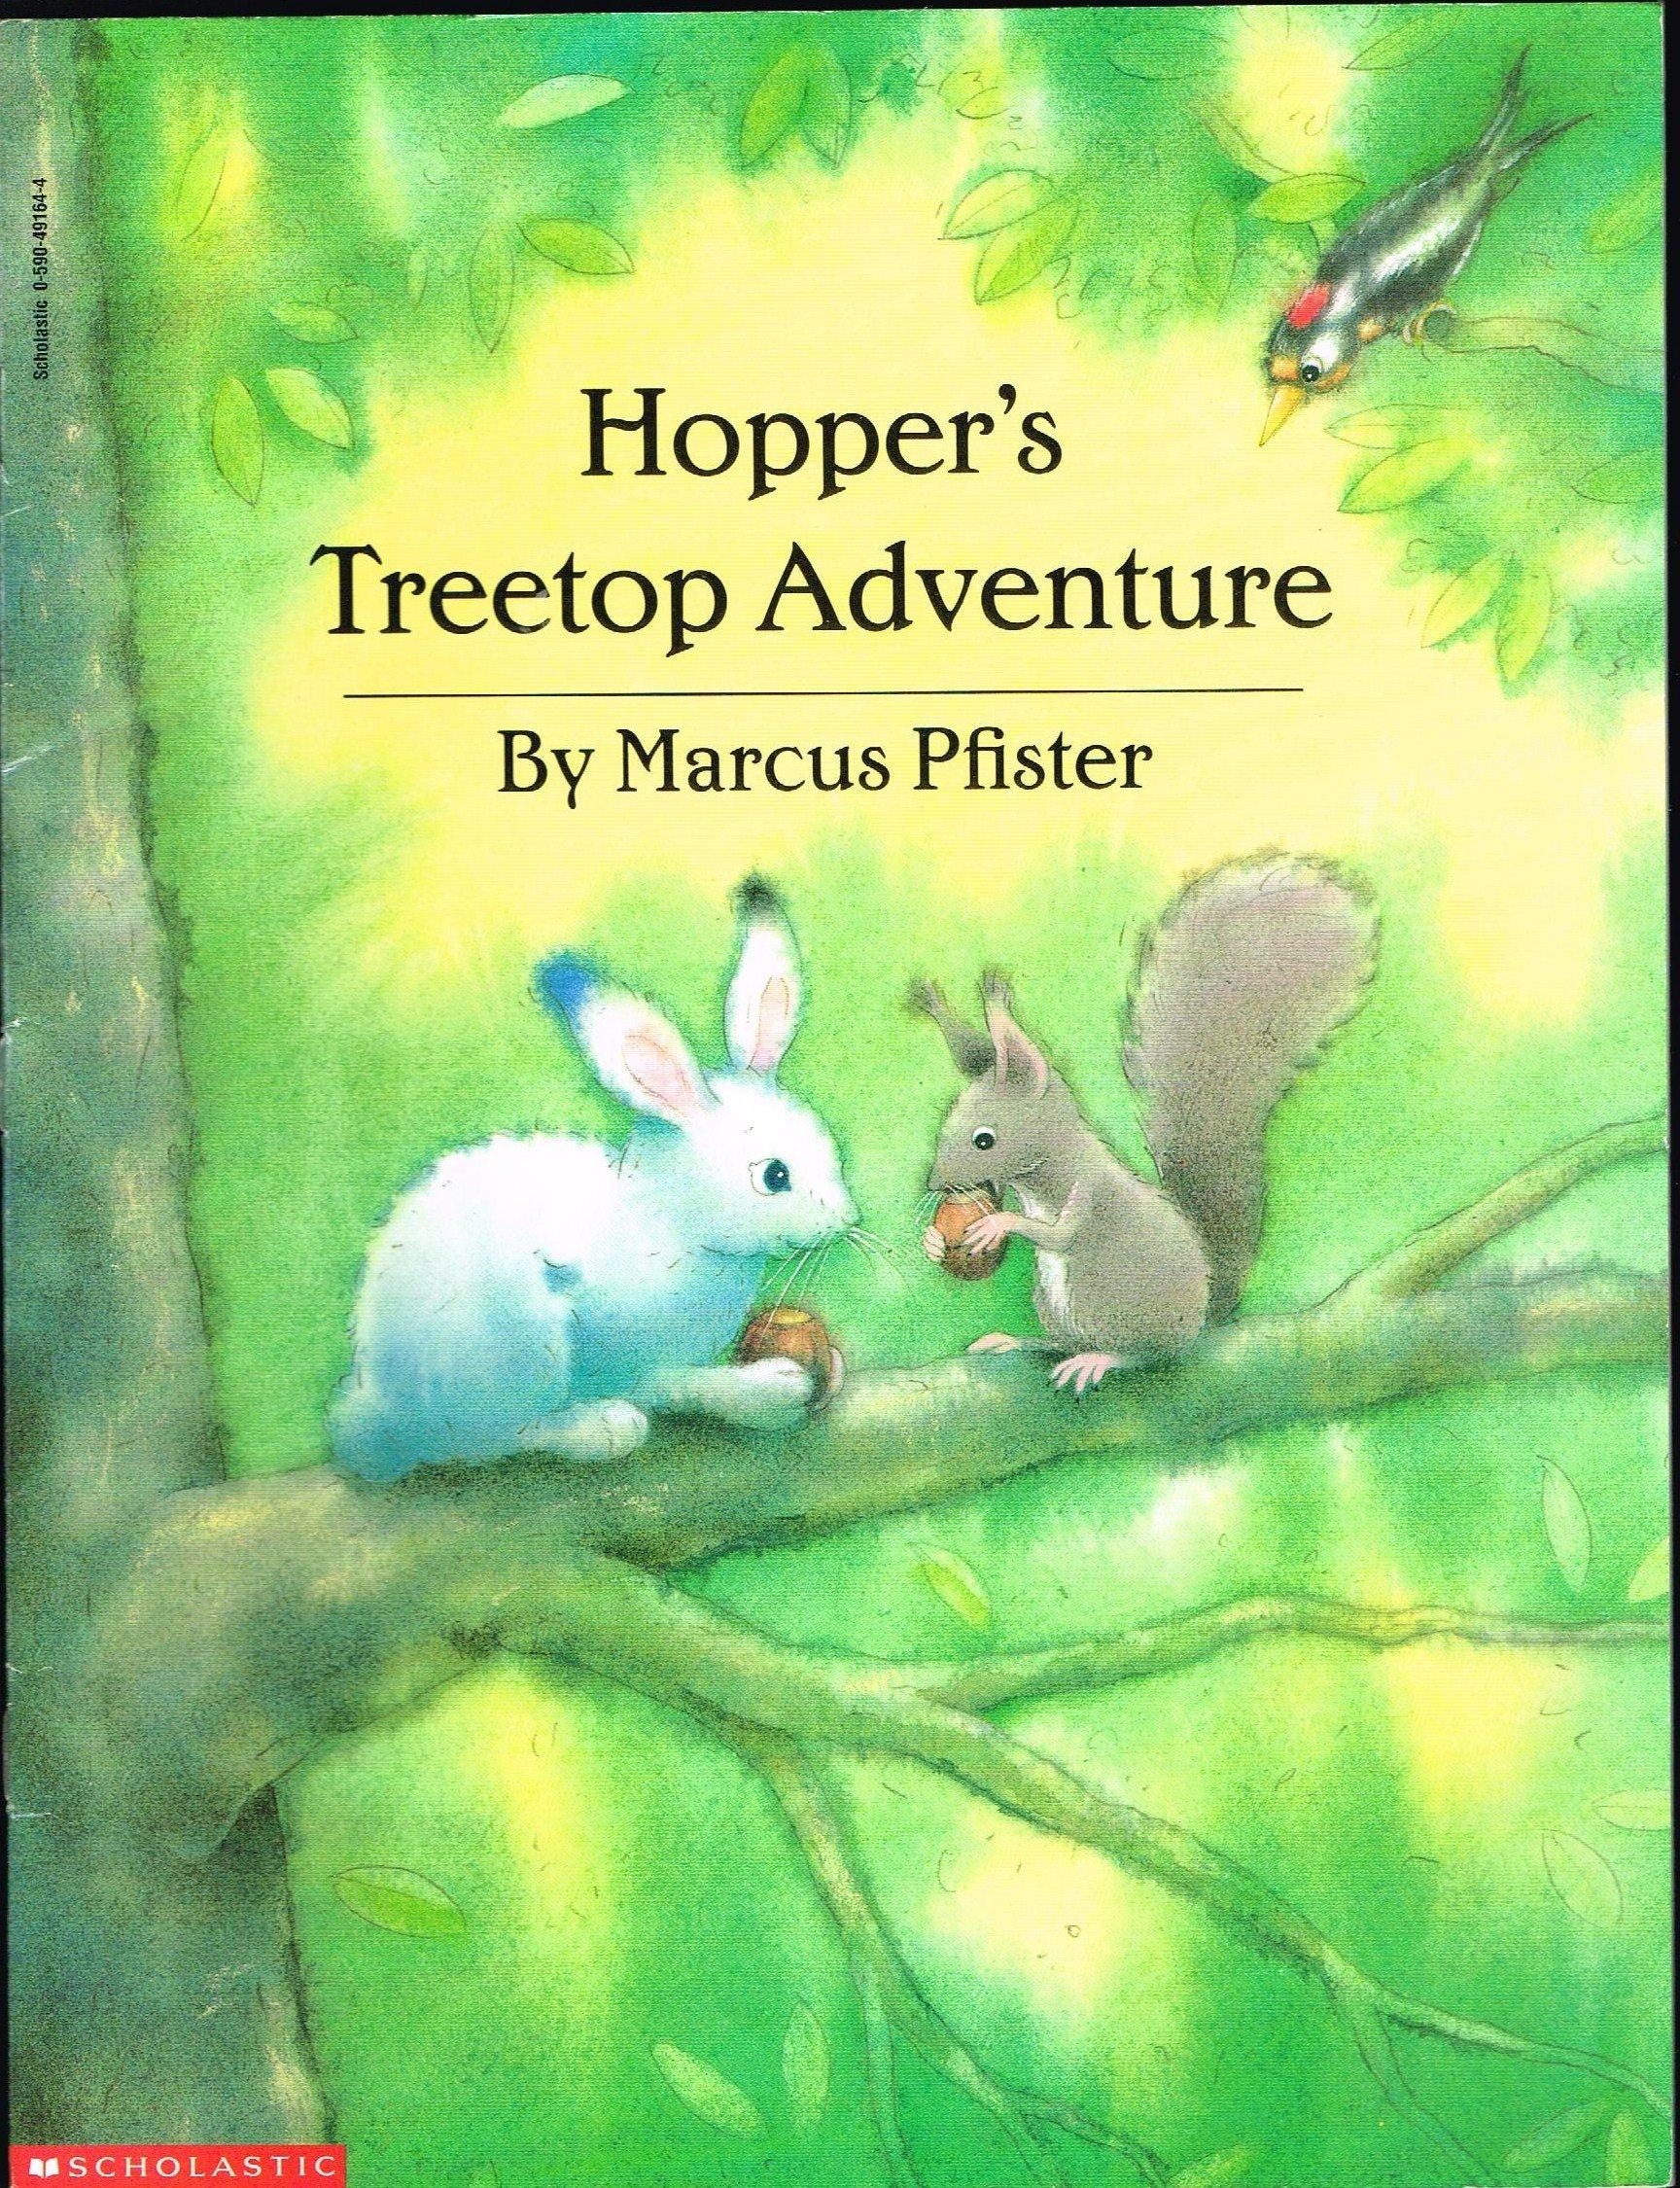 Hopper's Treetop Adventure: Marcus Pfister, Rosemary Lanning:  9780590491648: Amazon.com: Books